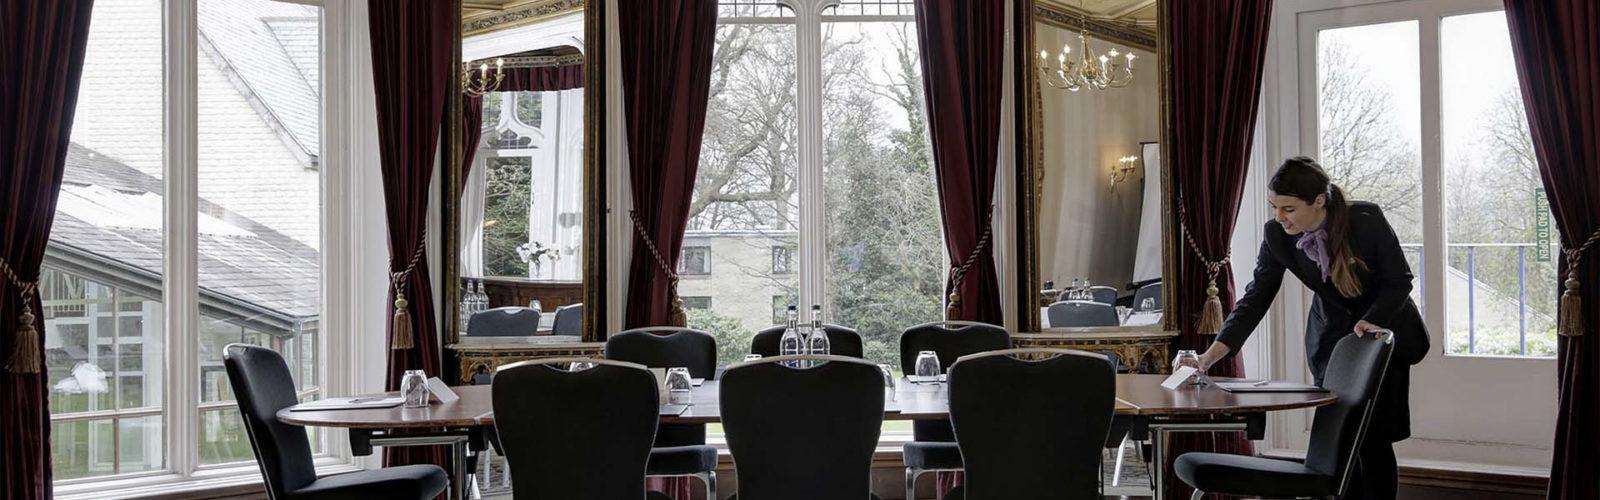 Meetings at Mercure Sheffield Kenwood Hall Hotel & Spa Vine Hotel Management